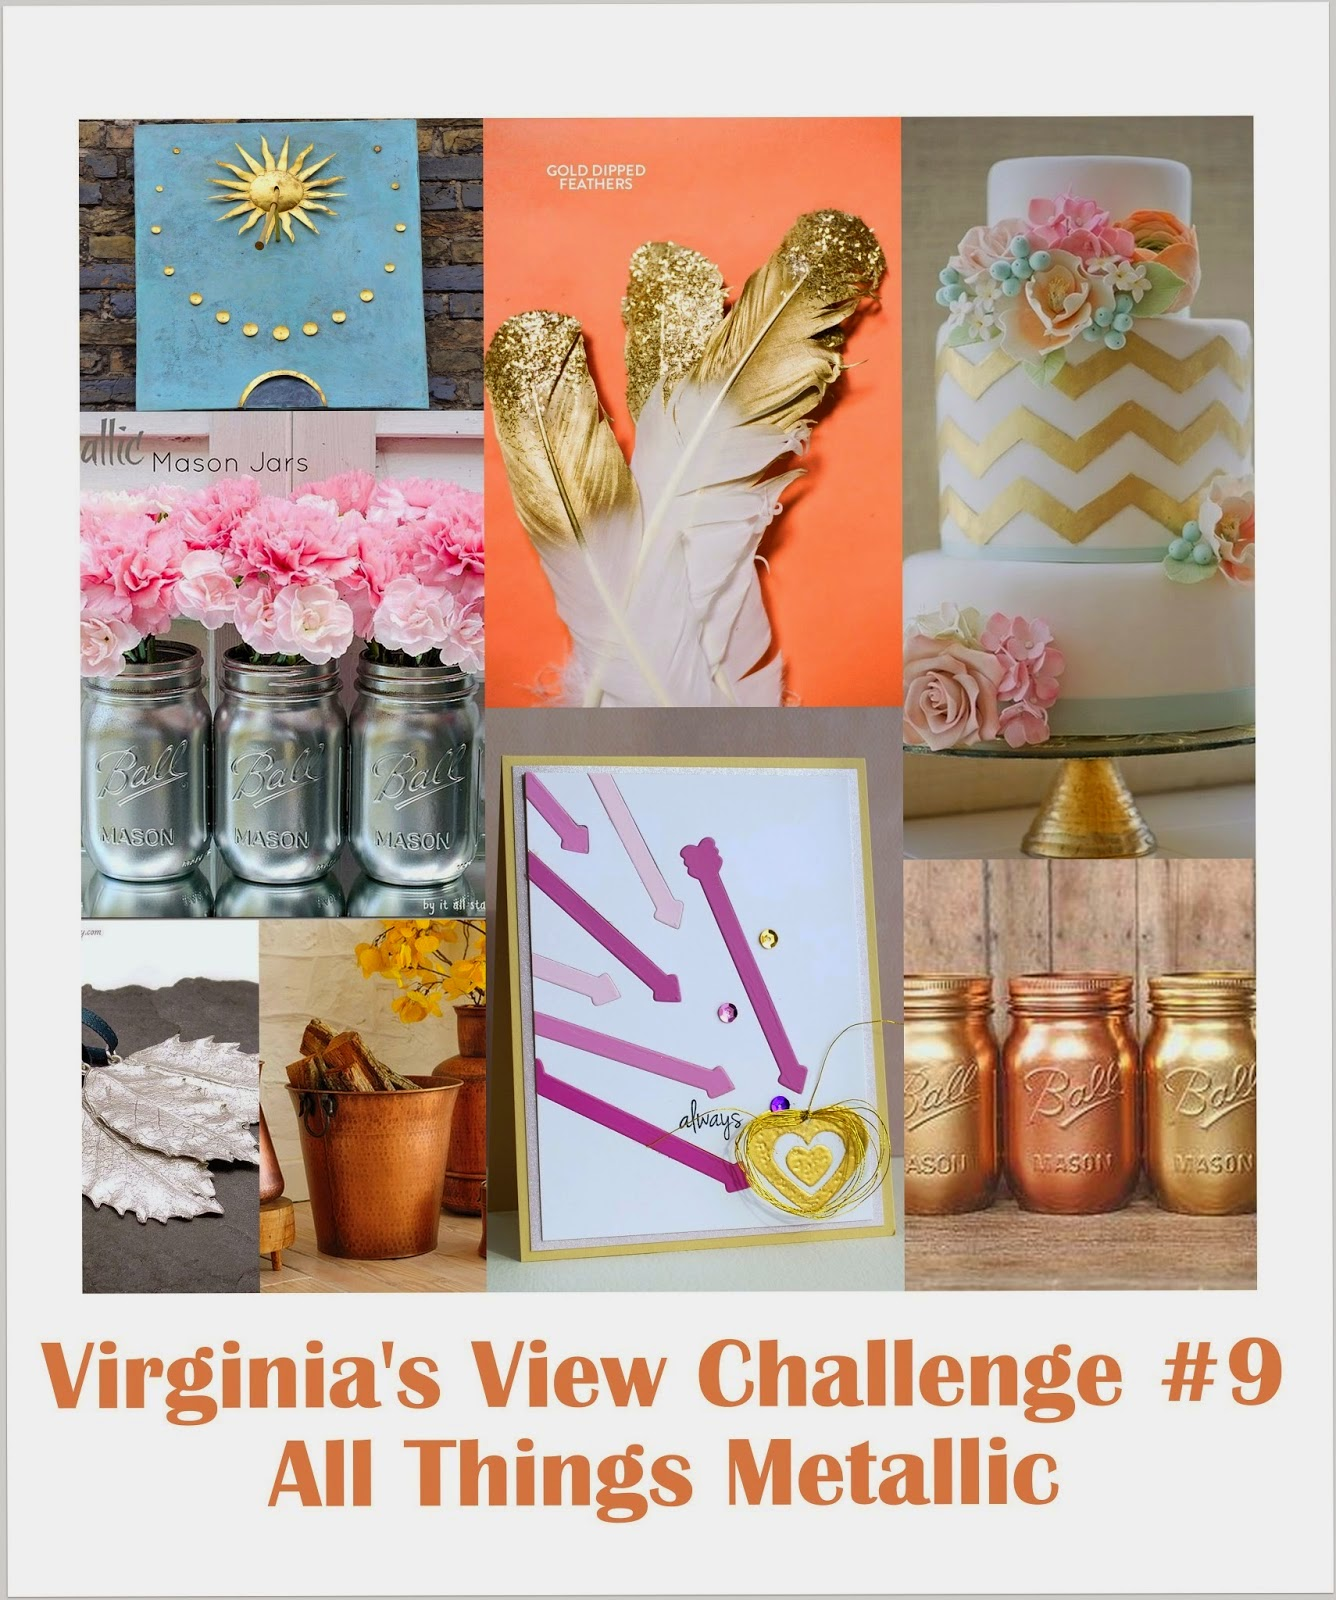 http://virginiasviewchallenge.blogspot.com.au/2014/11/virginias-view-challenge-9.html